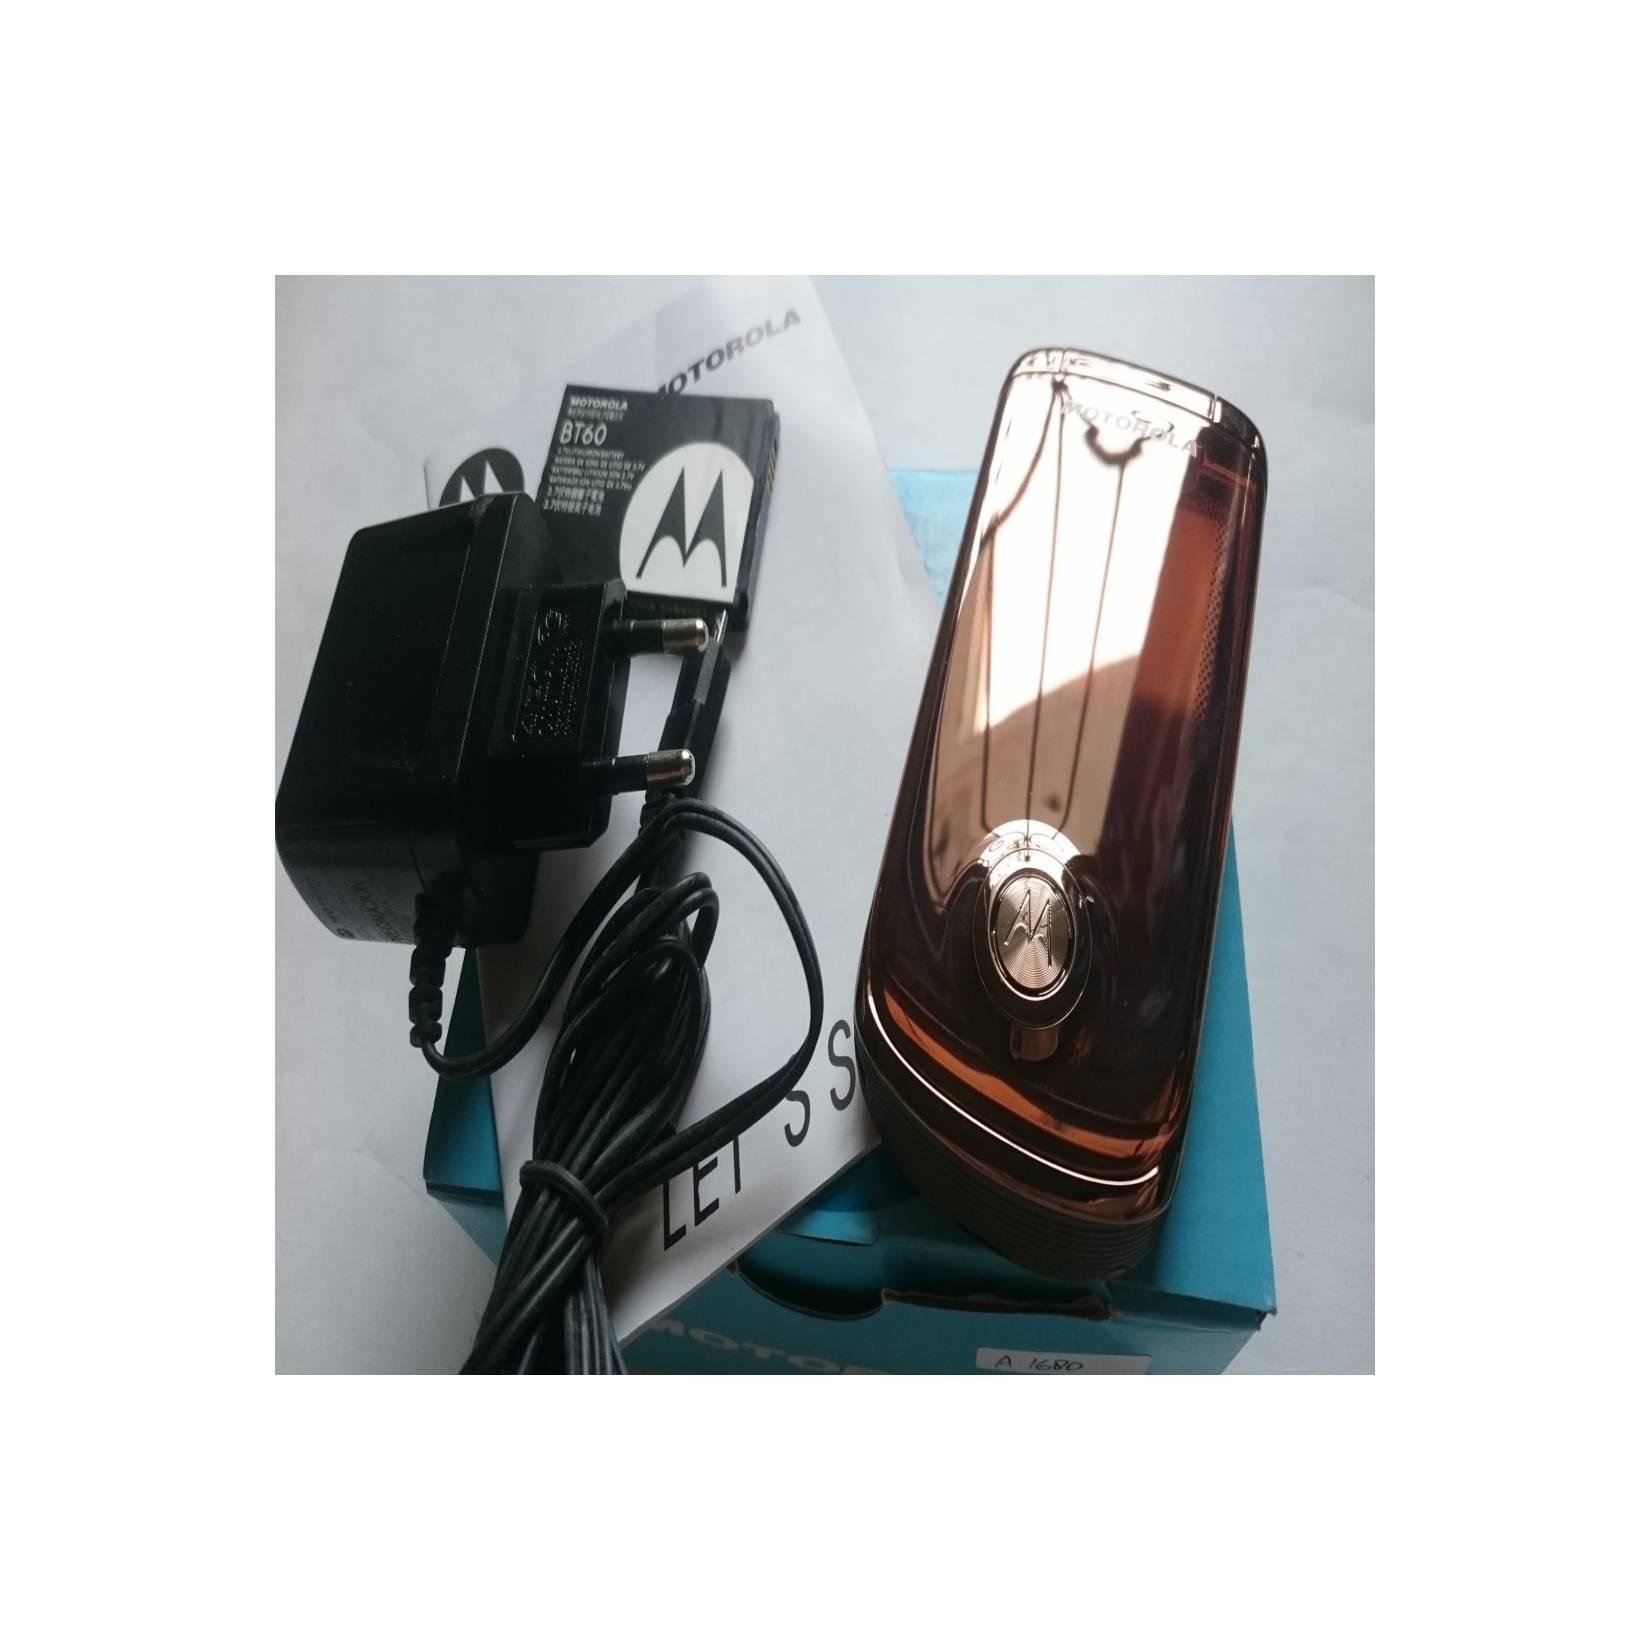 Motorola MING A1680 - Lucky 3G Rose Emas - HP Jadul Original